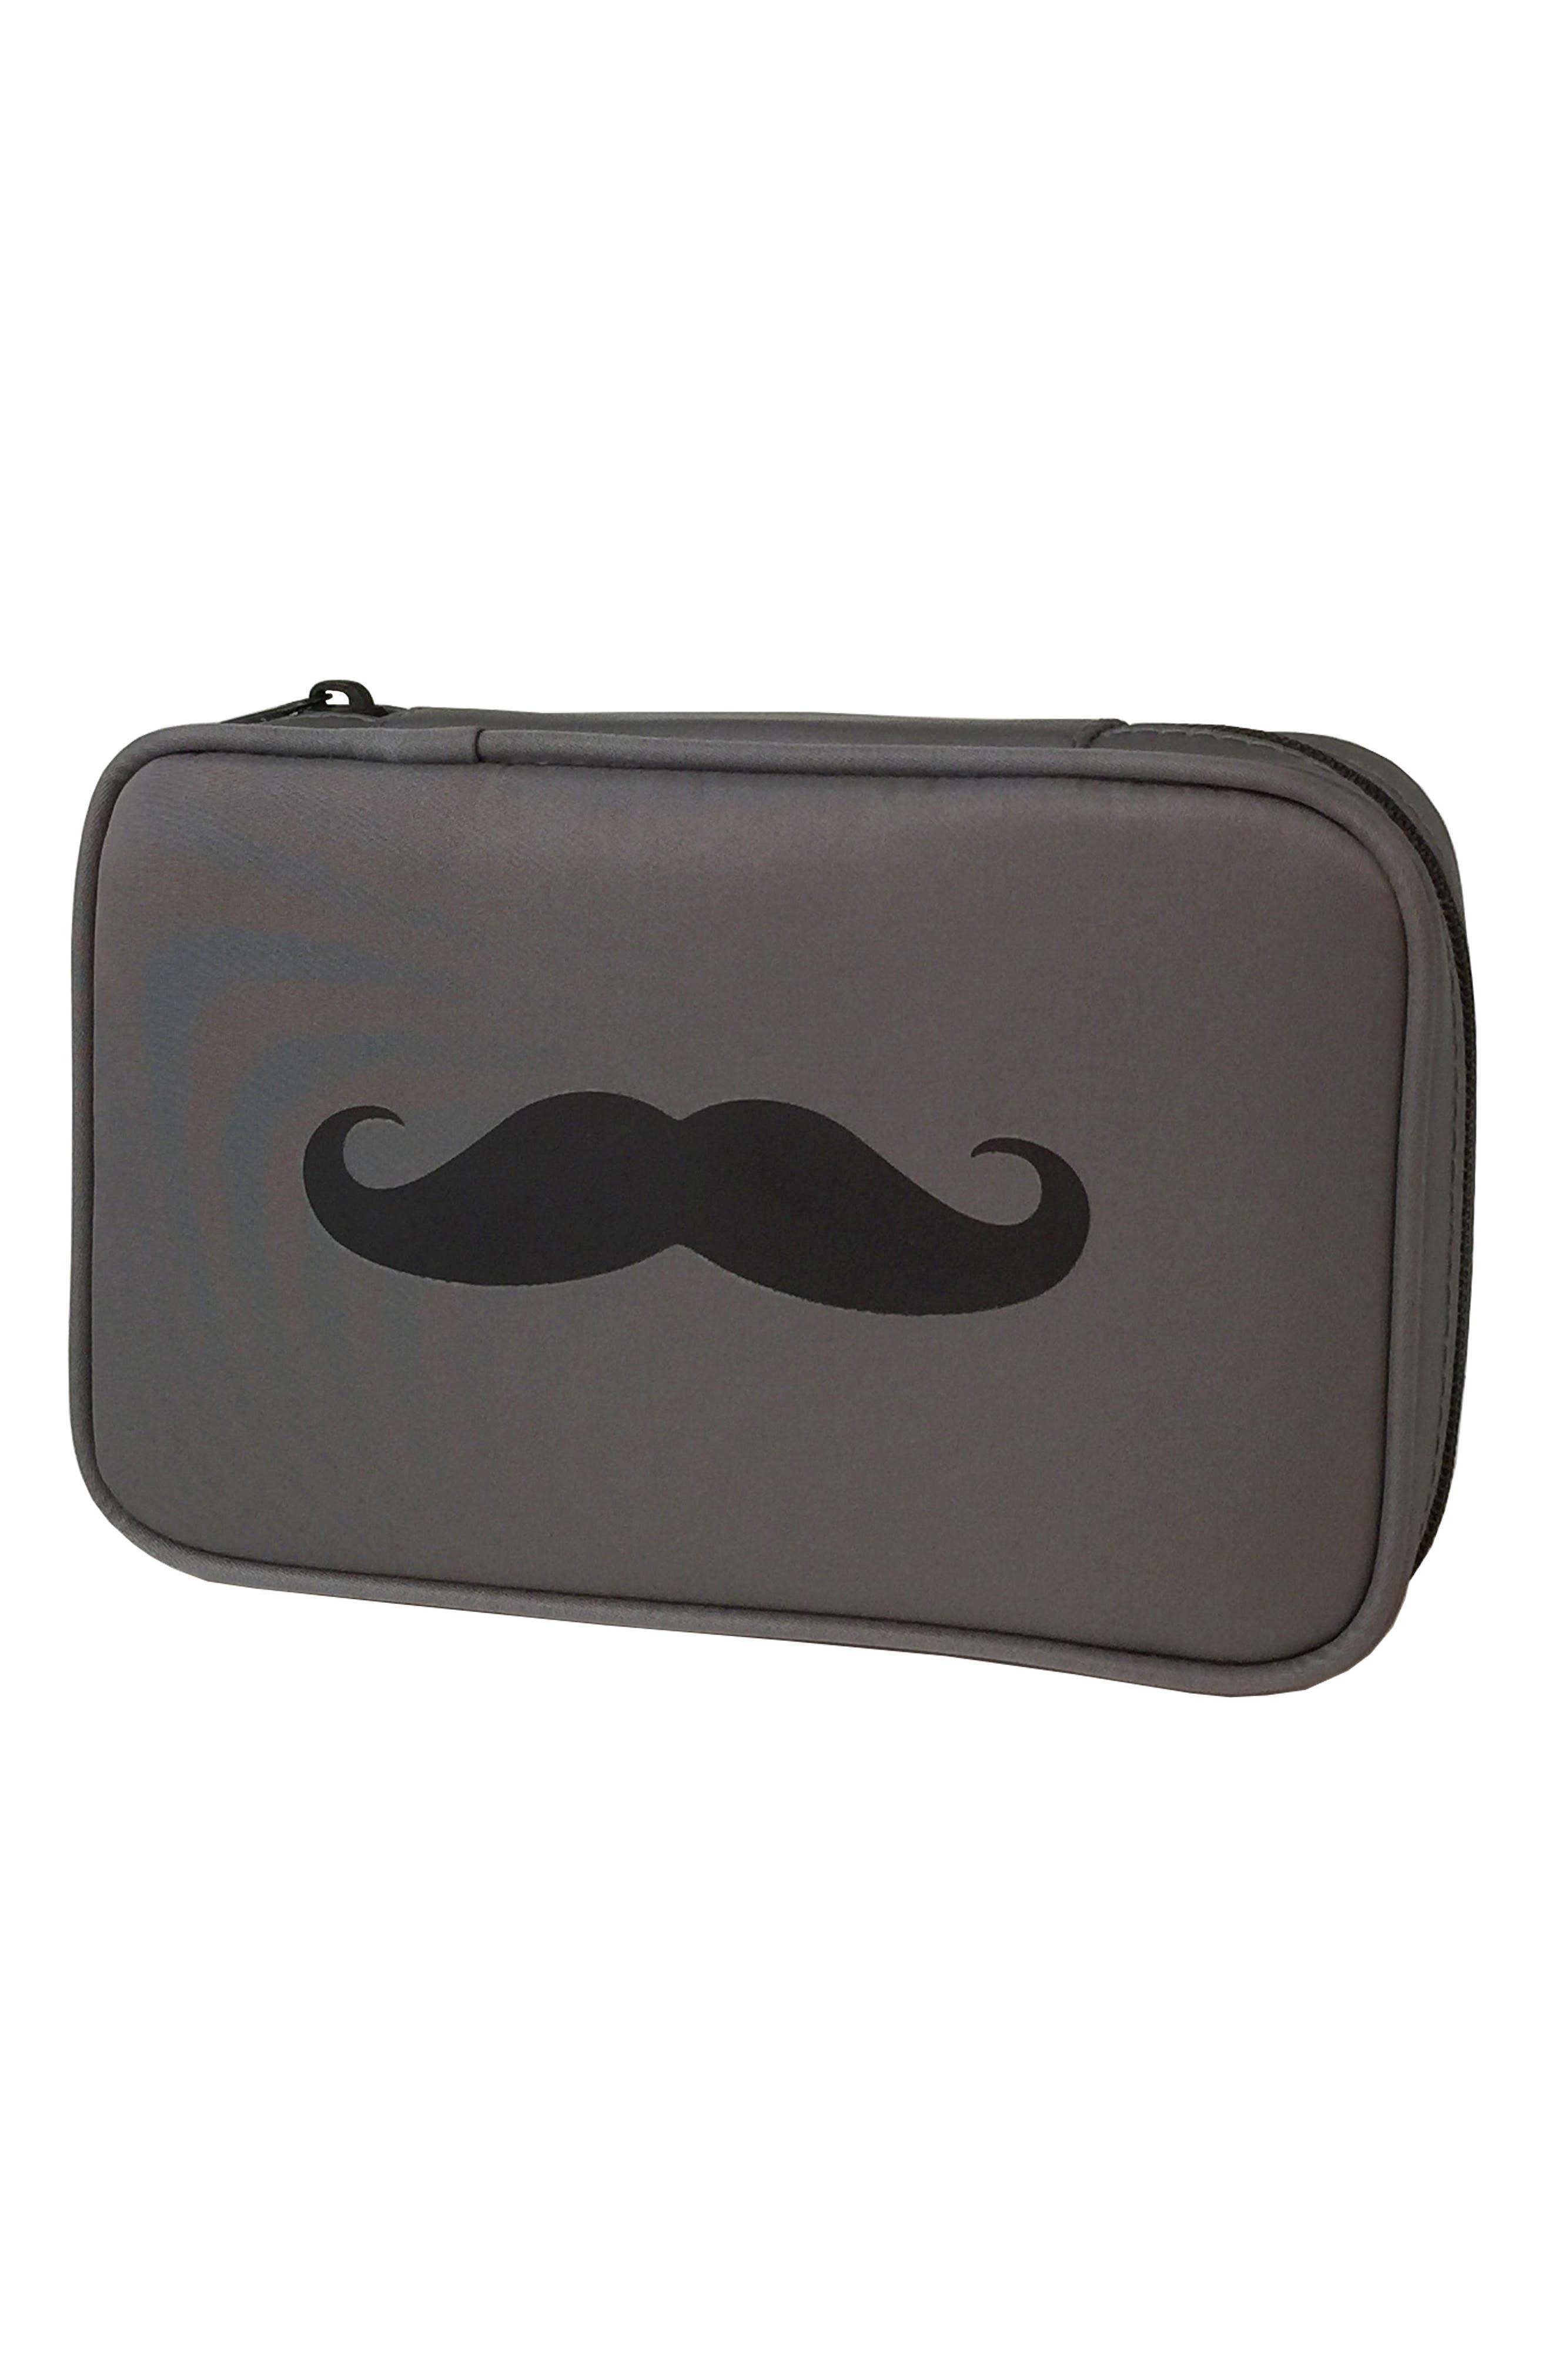 SKITS Clever Mustache Tech Case